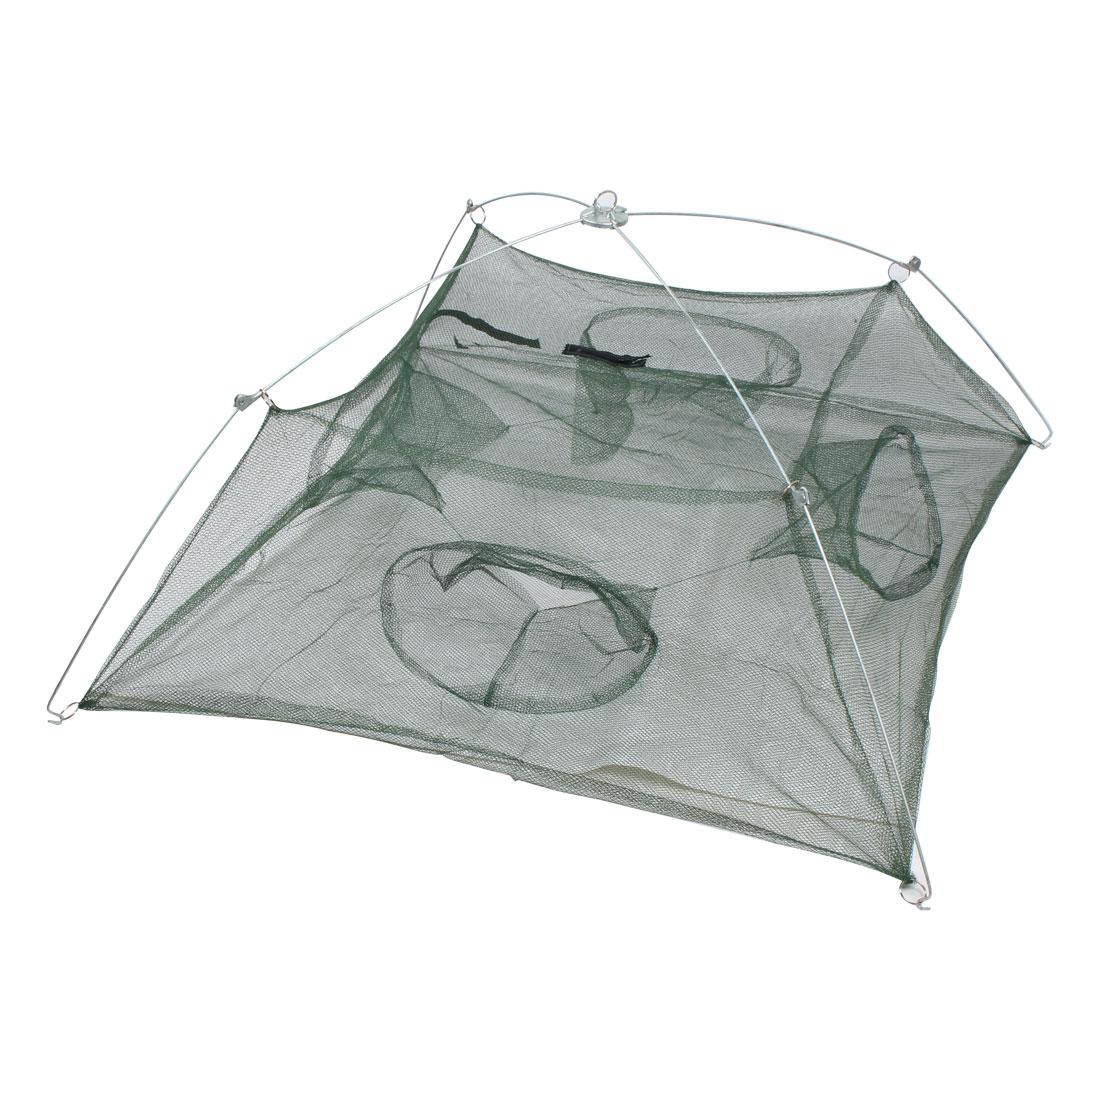 100cmx100cm Foldable Mesh Crawdad Shrimp Umbrella Cast Fishing Dip Net